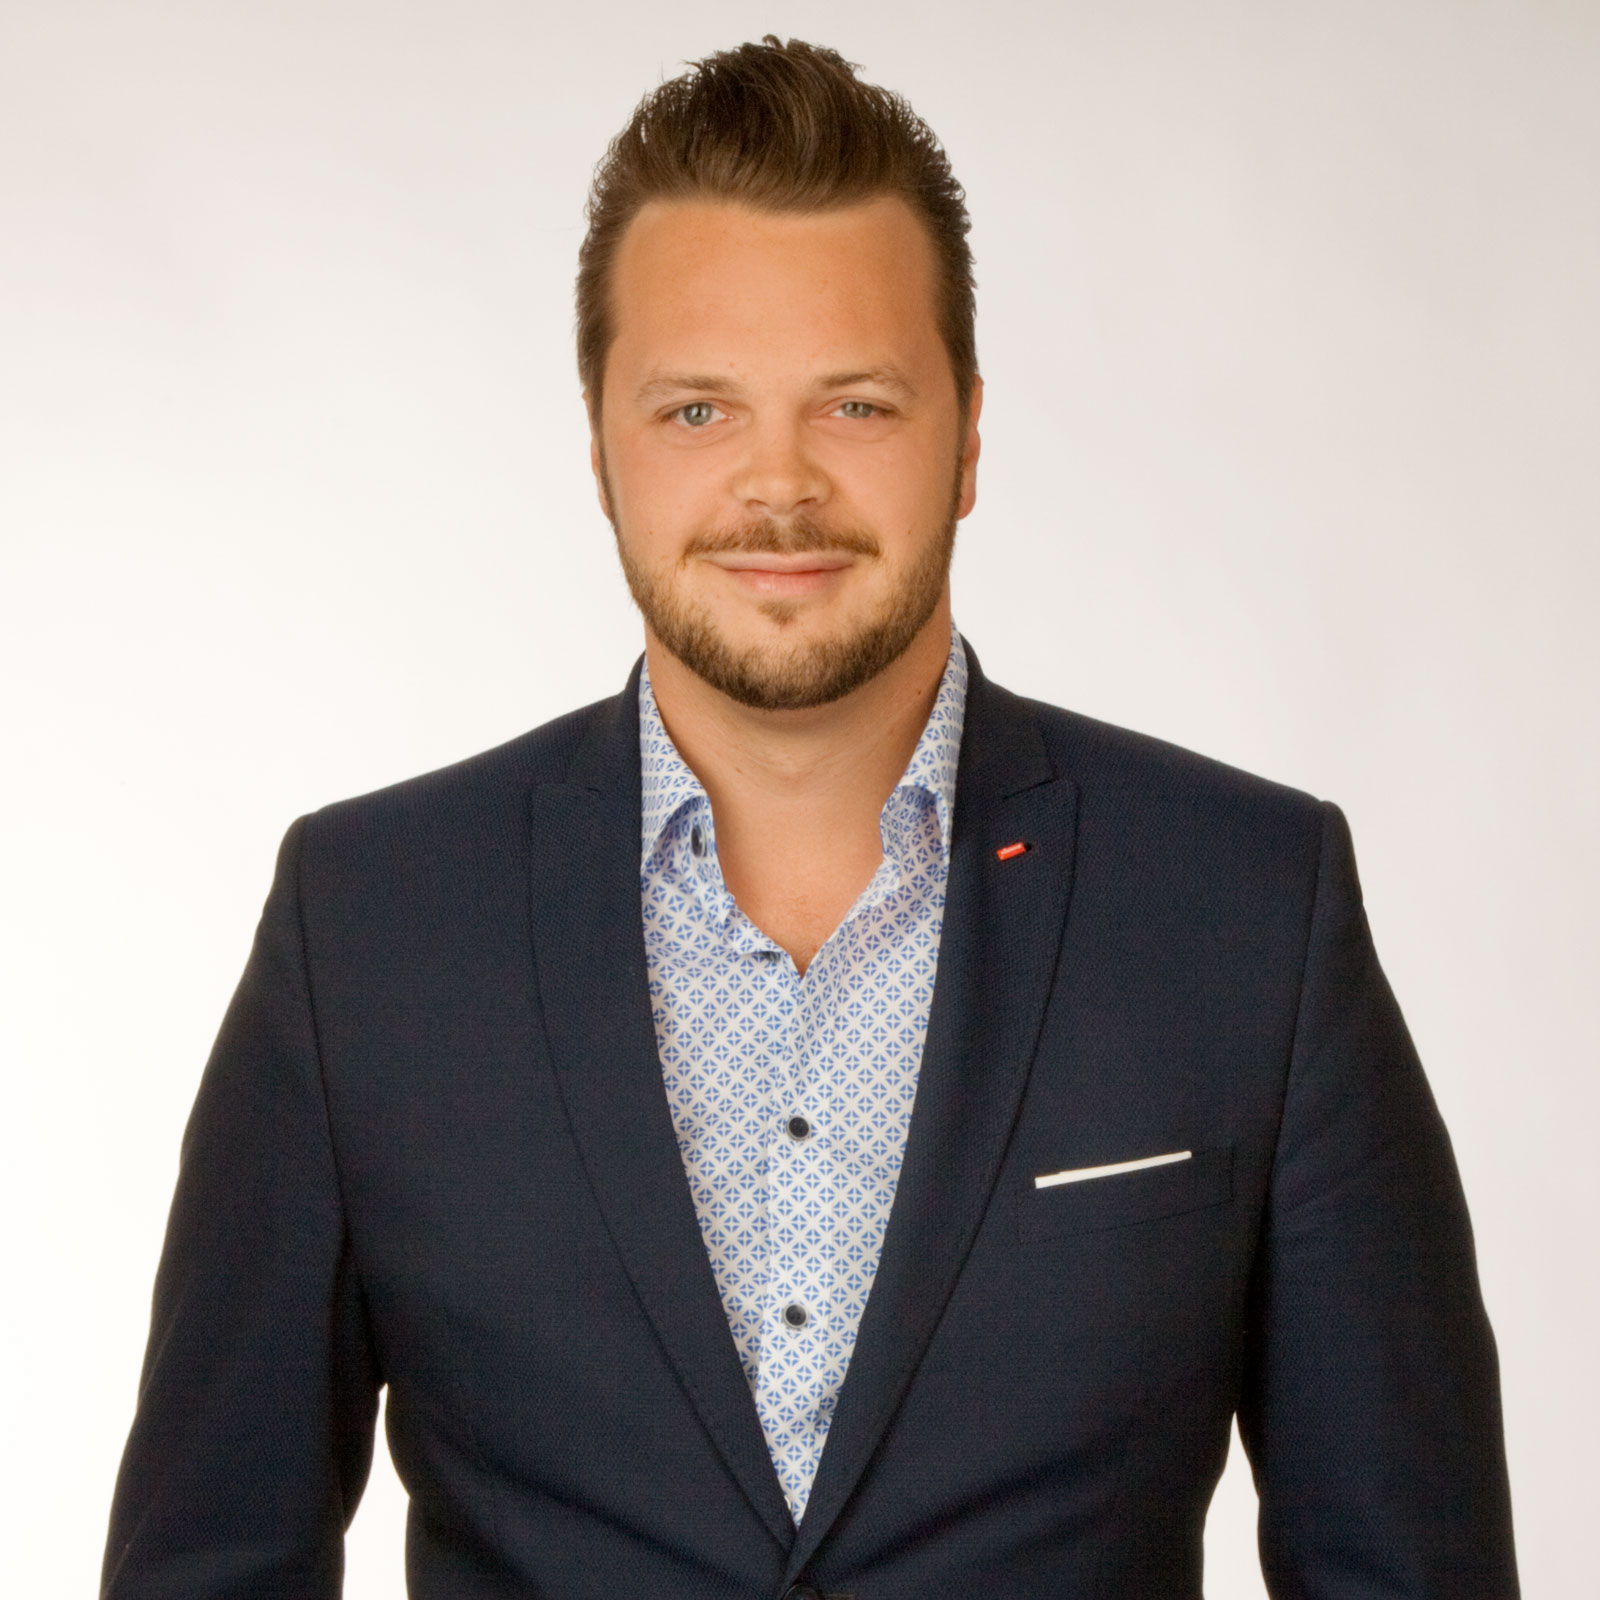 Finanzberater in Innsbruck: Dominik Heschl